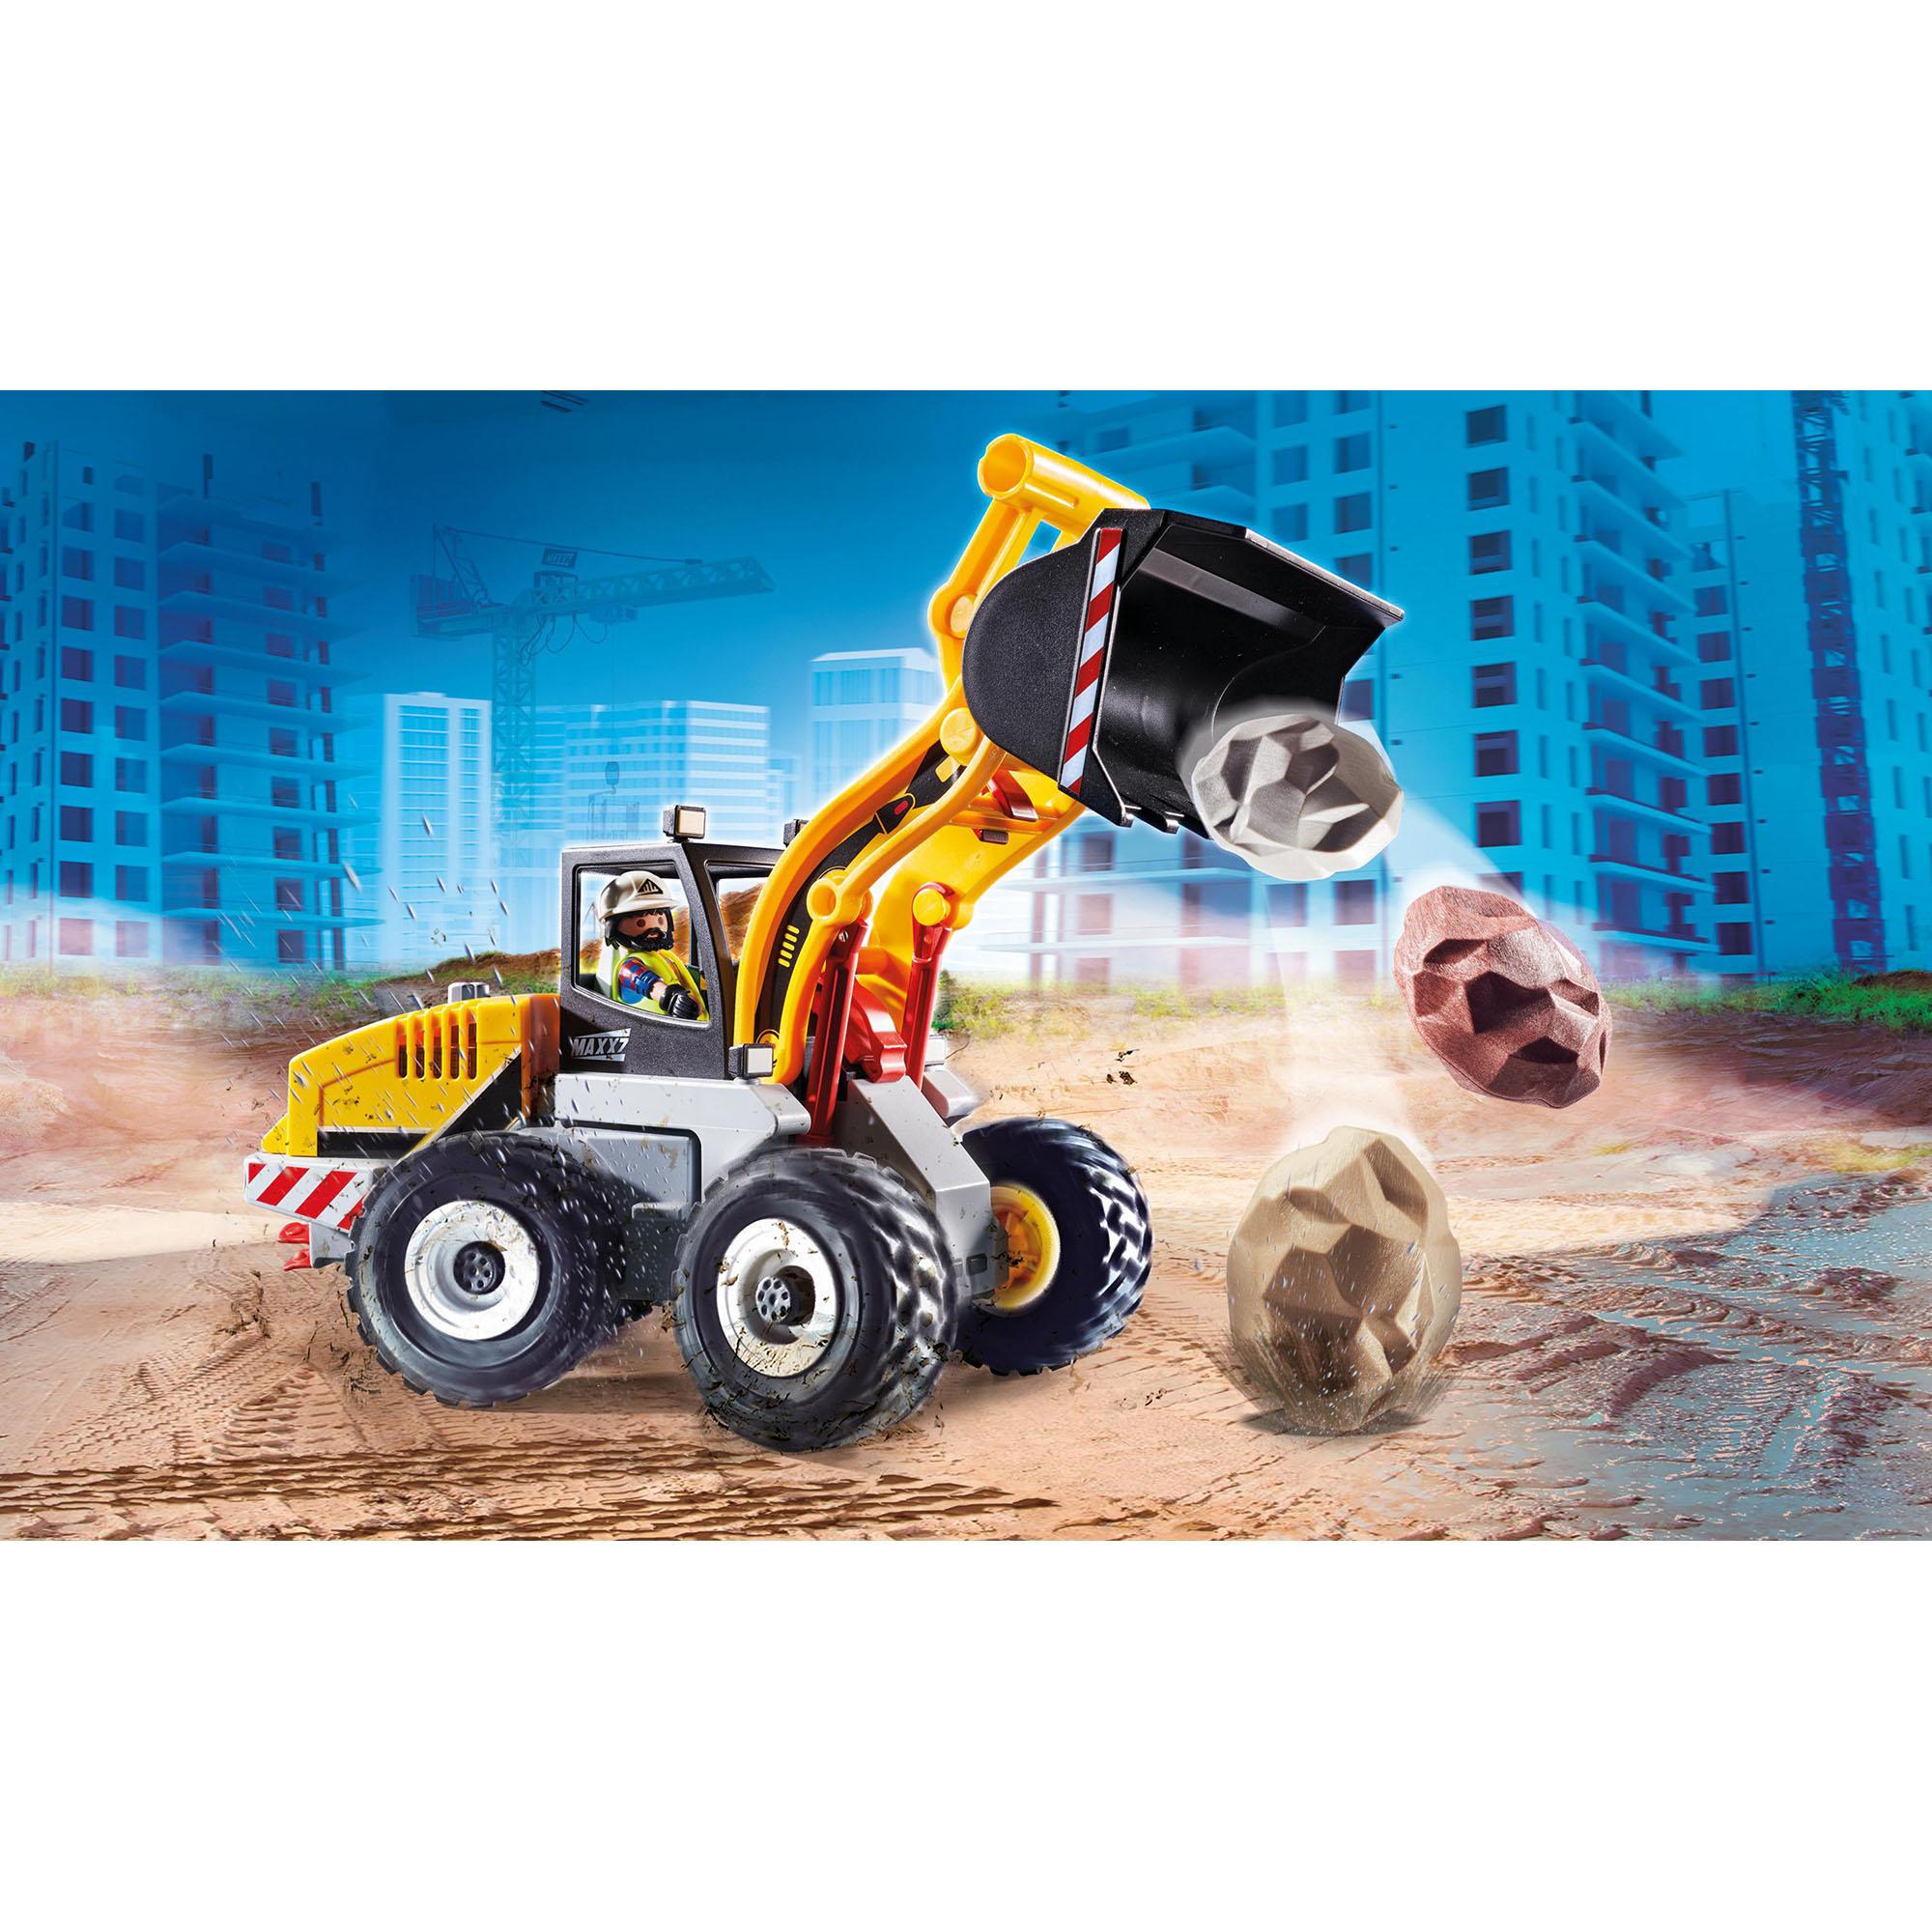 Incarcator frontal playmobil city action - 2